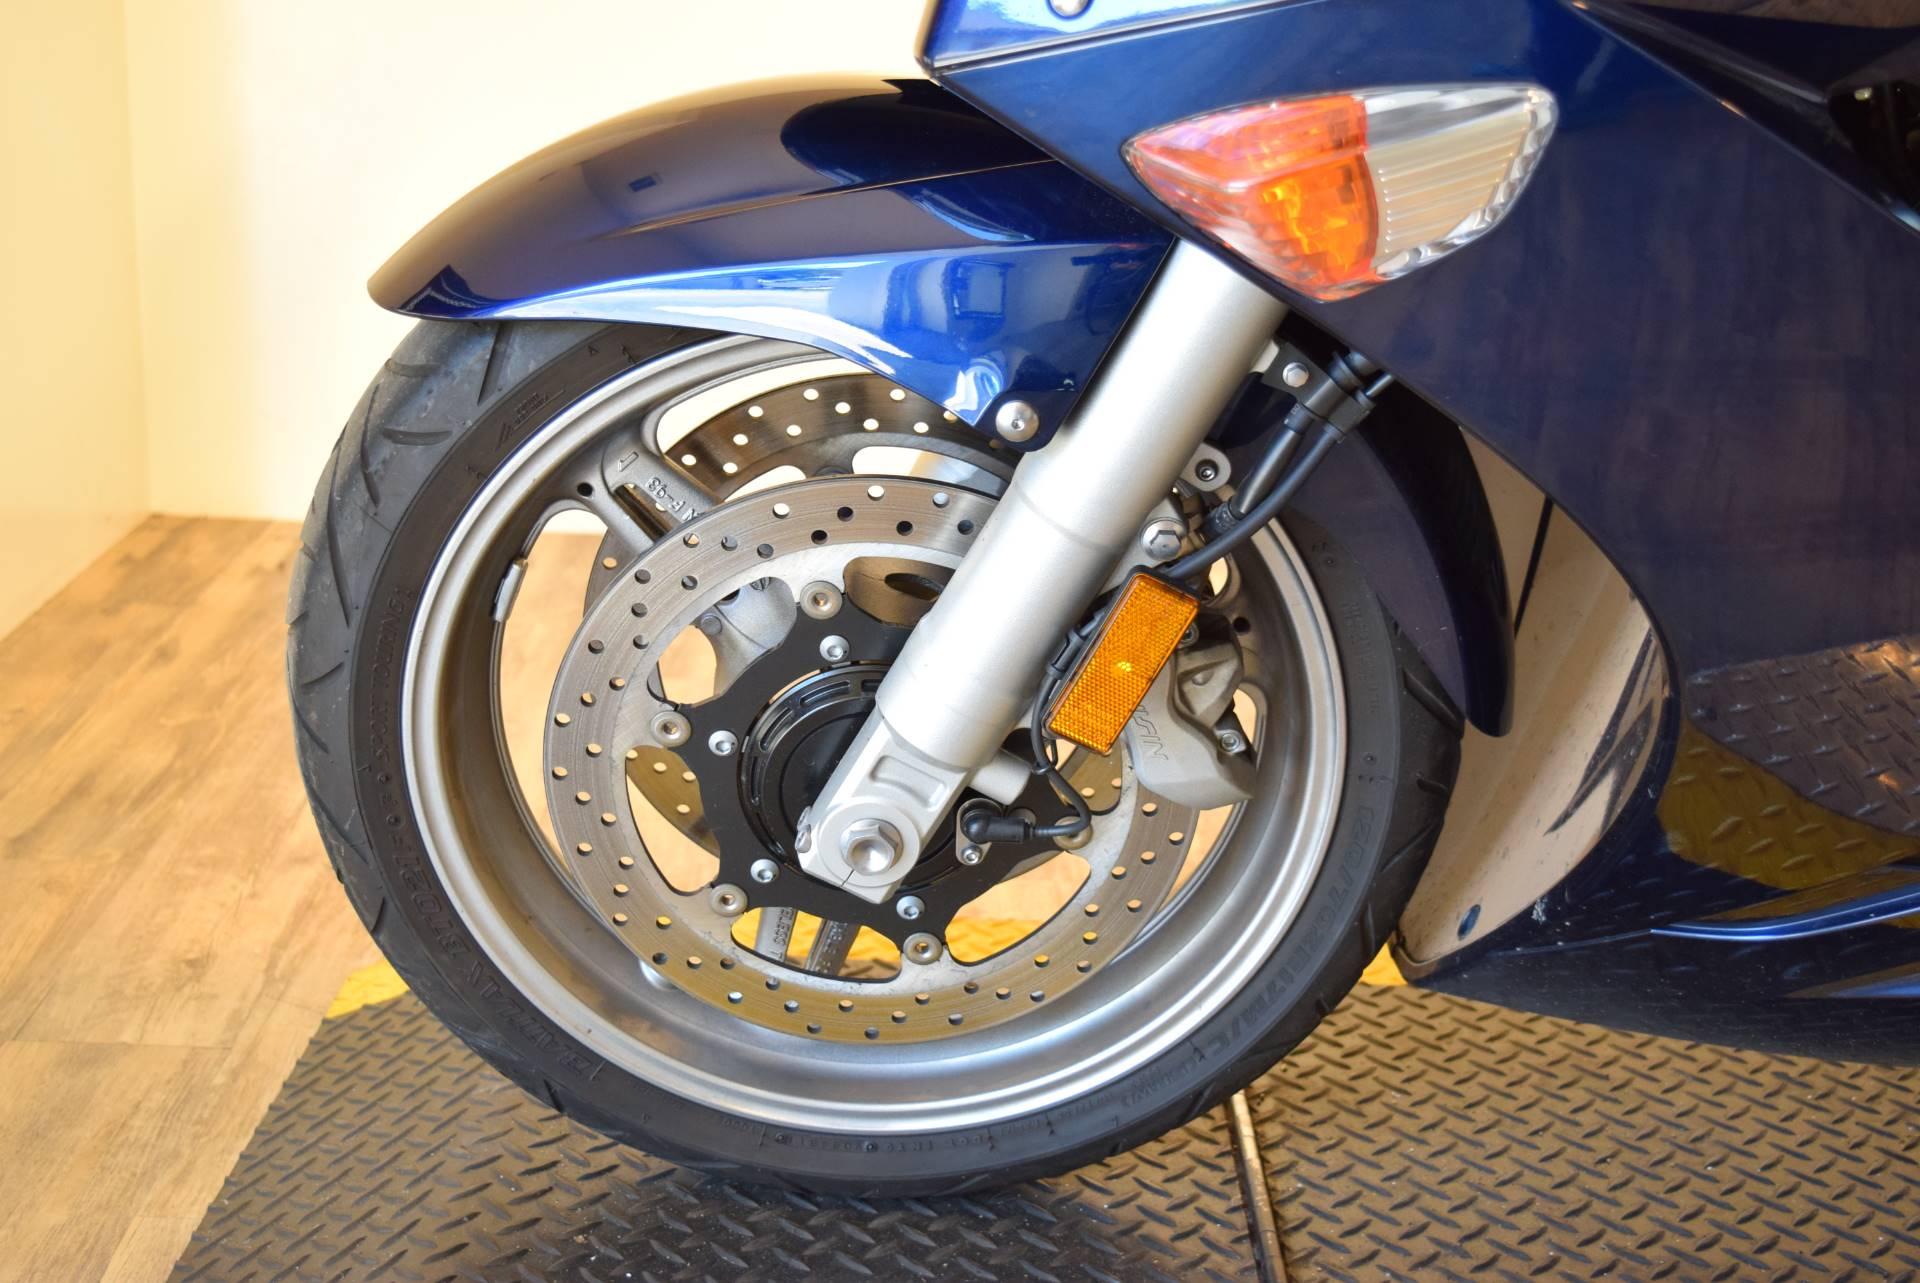 2012 Yamaha FJR1300A 11